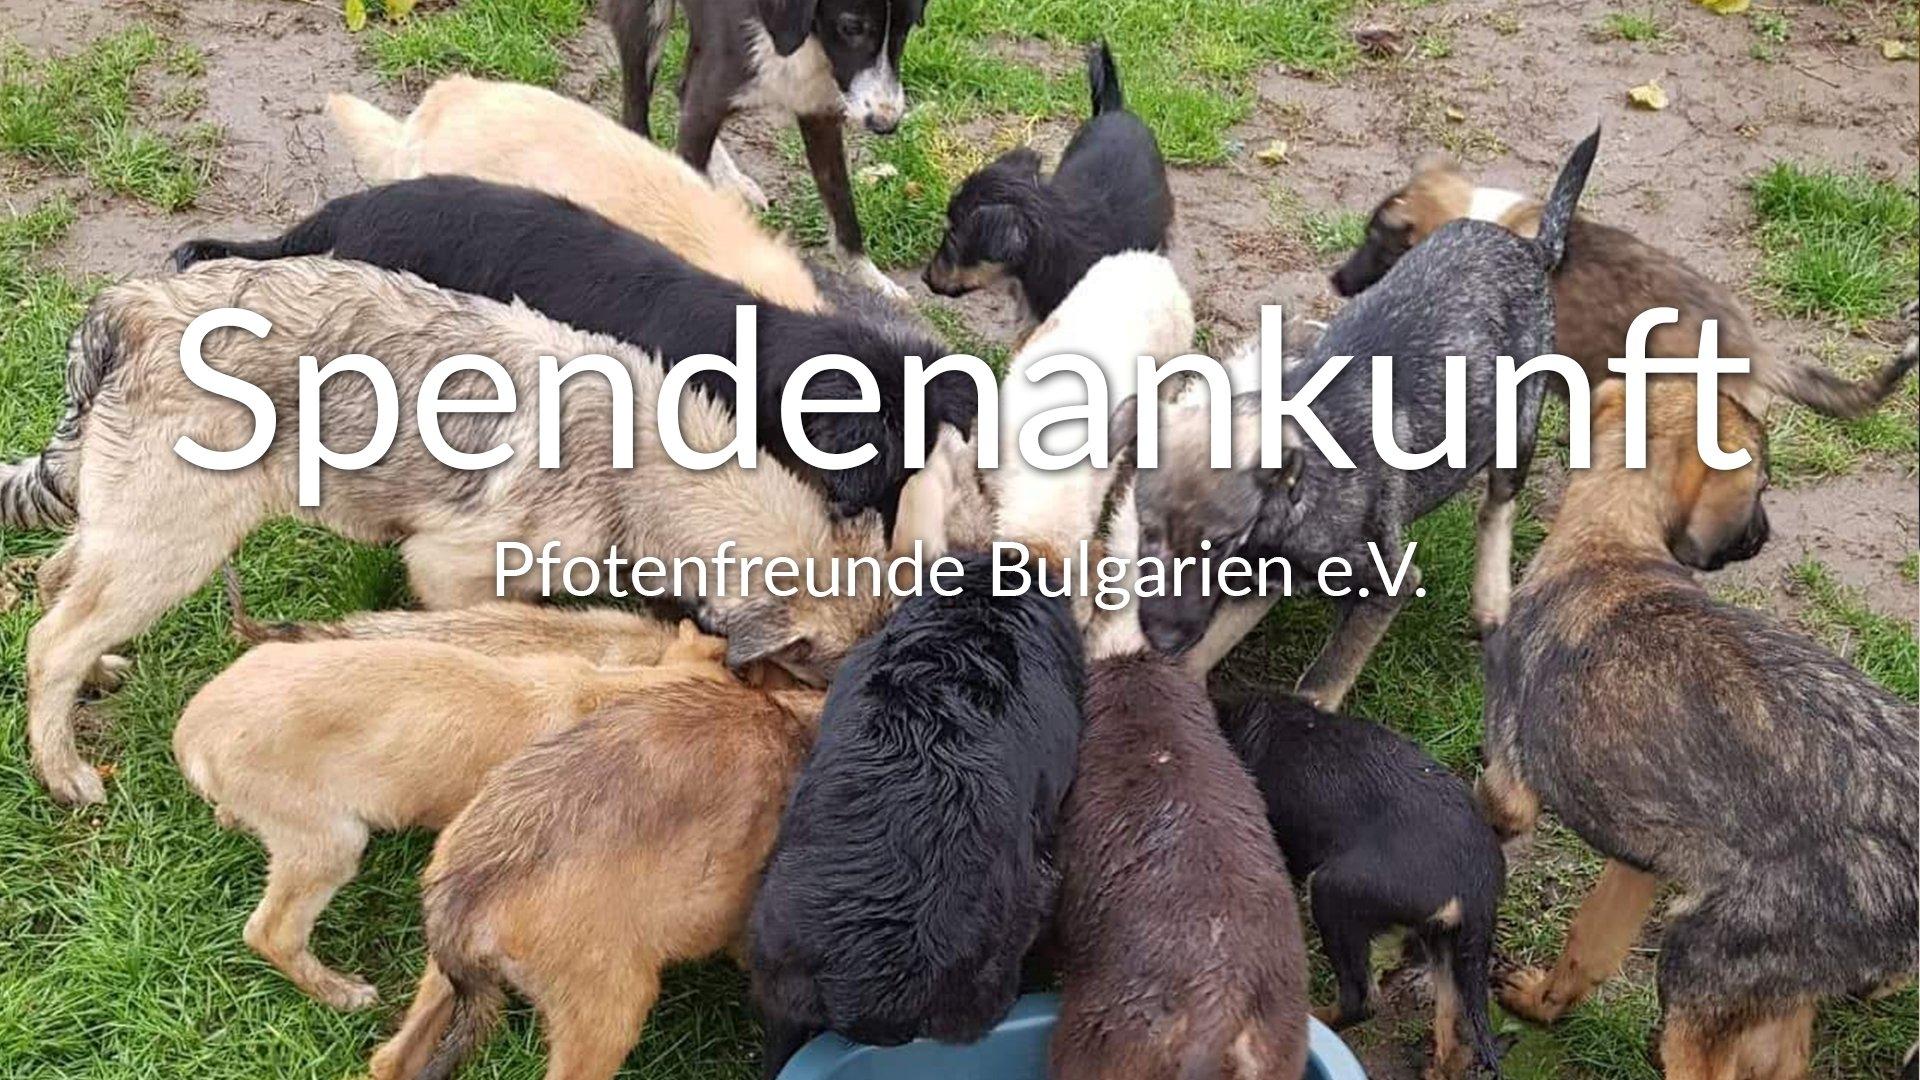 Pfotenfreunde Bulgarien e.V.-Futterspendenankunft-THdM Oktober-Bulgarien-VIDEO